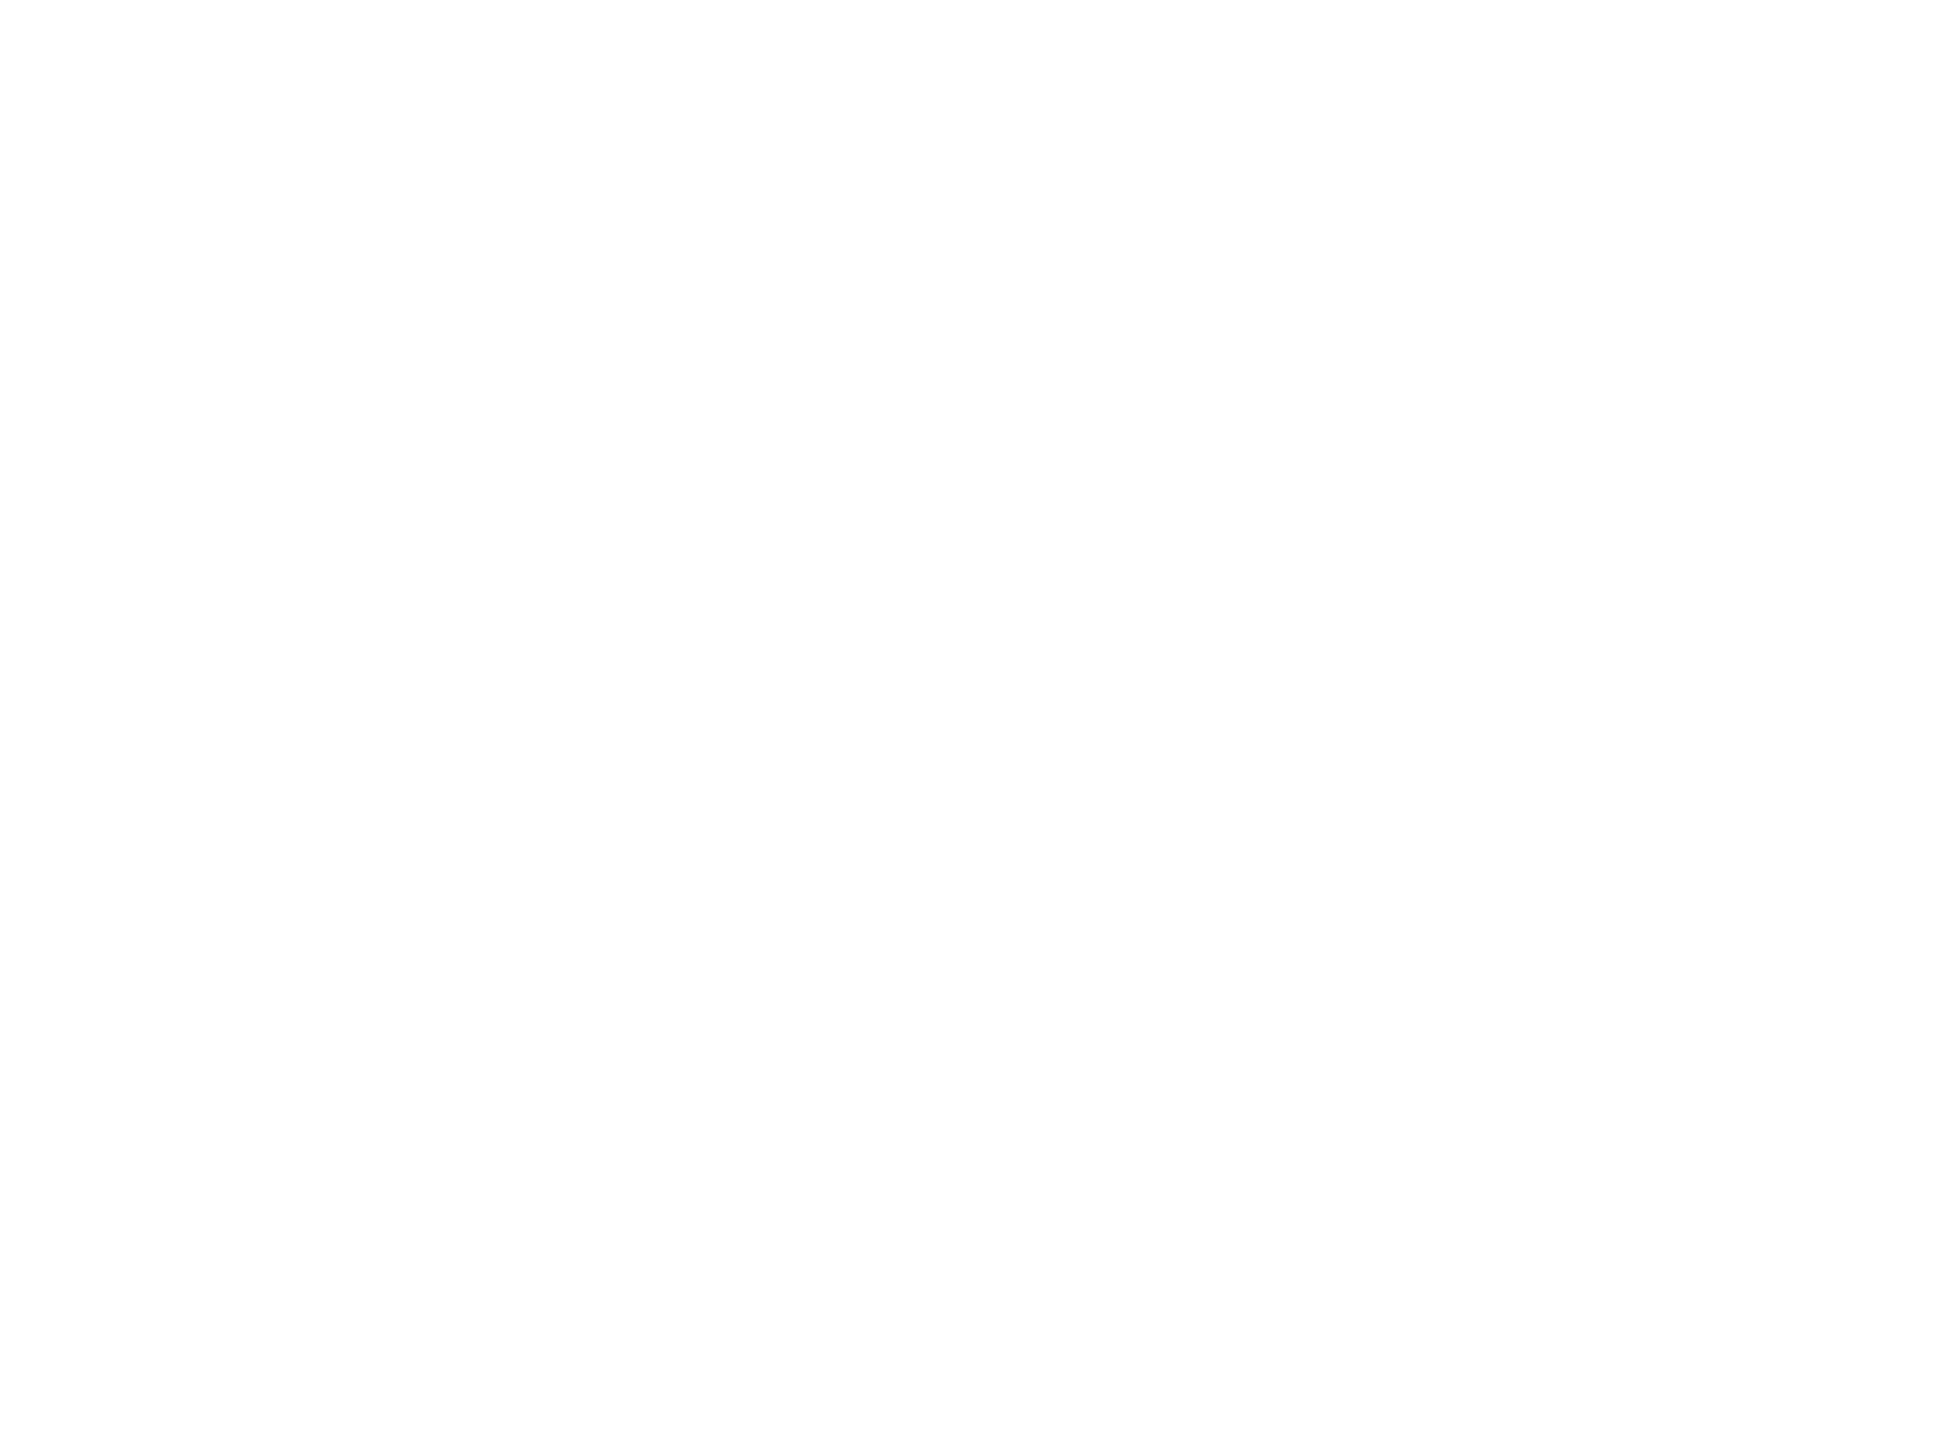 logo jacek reality white